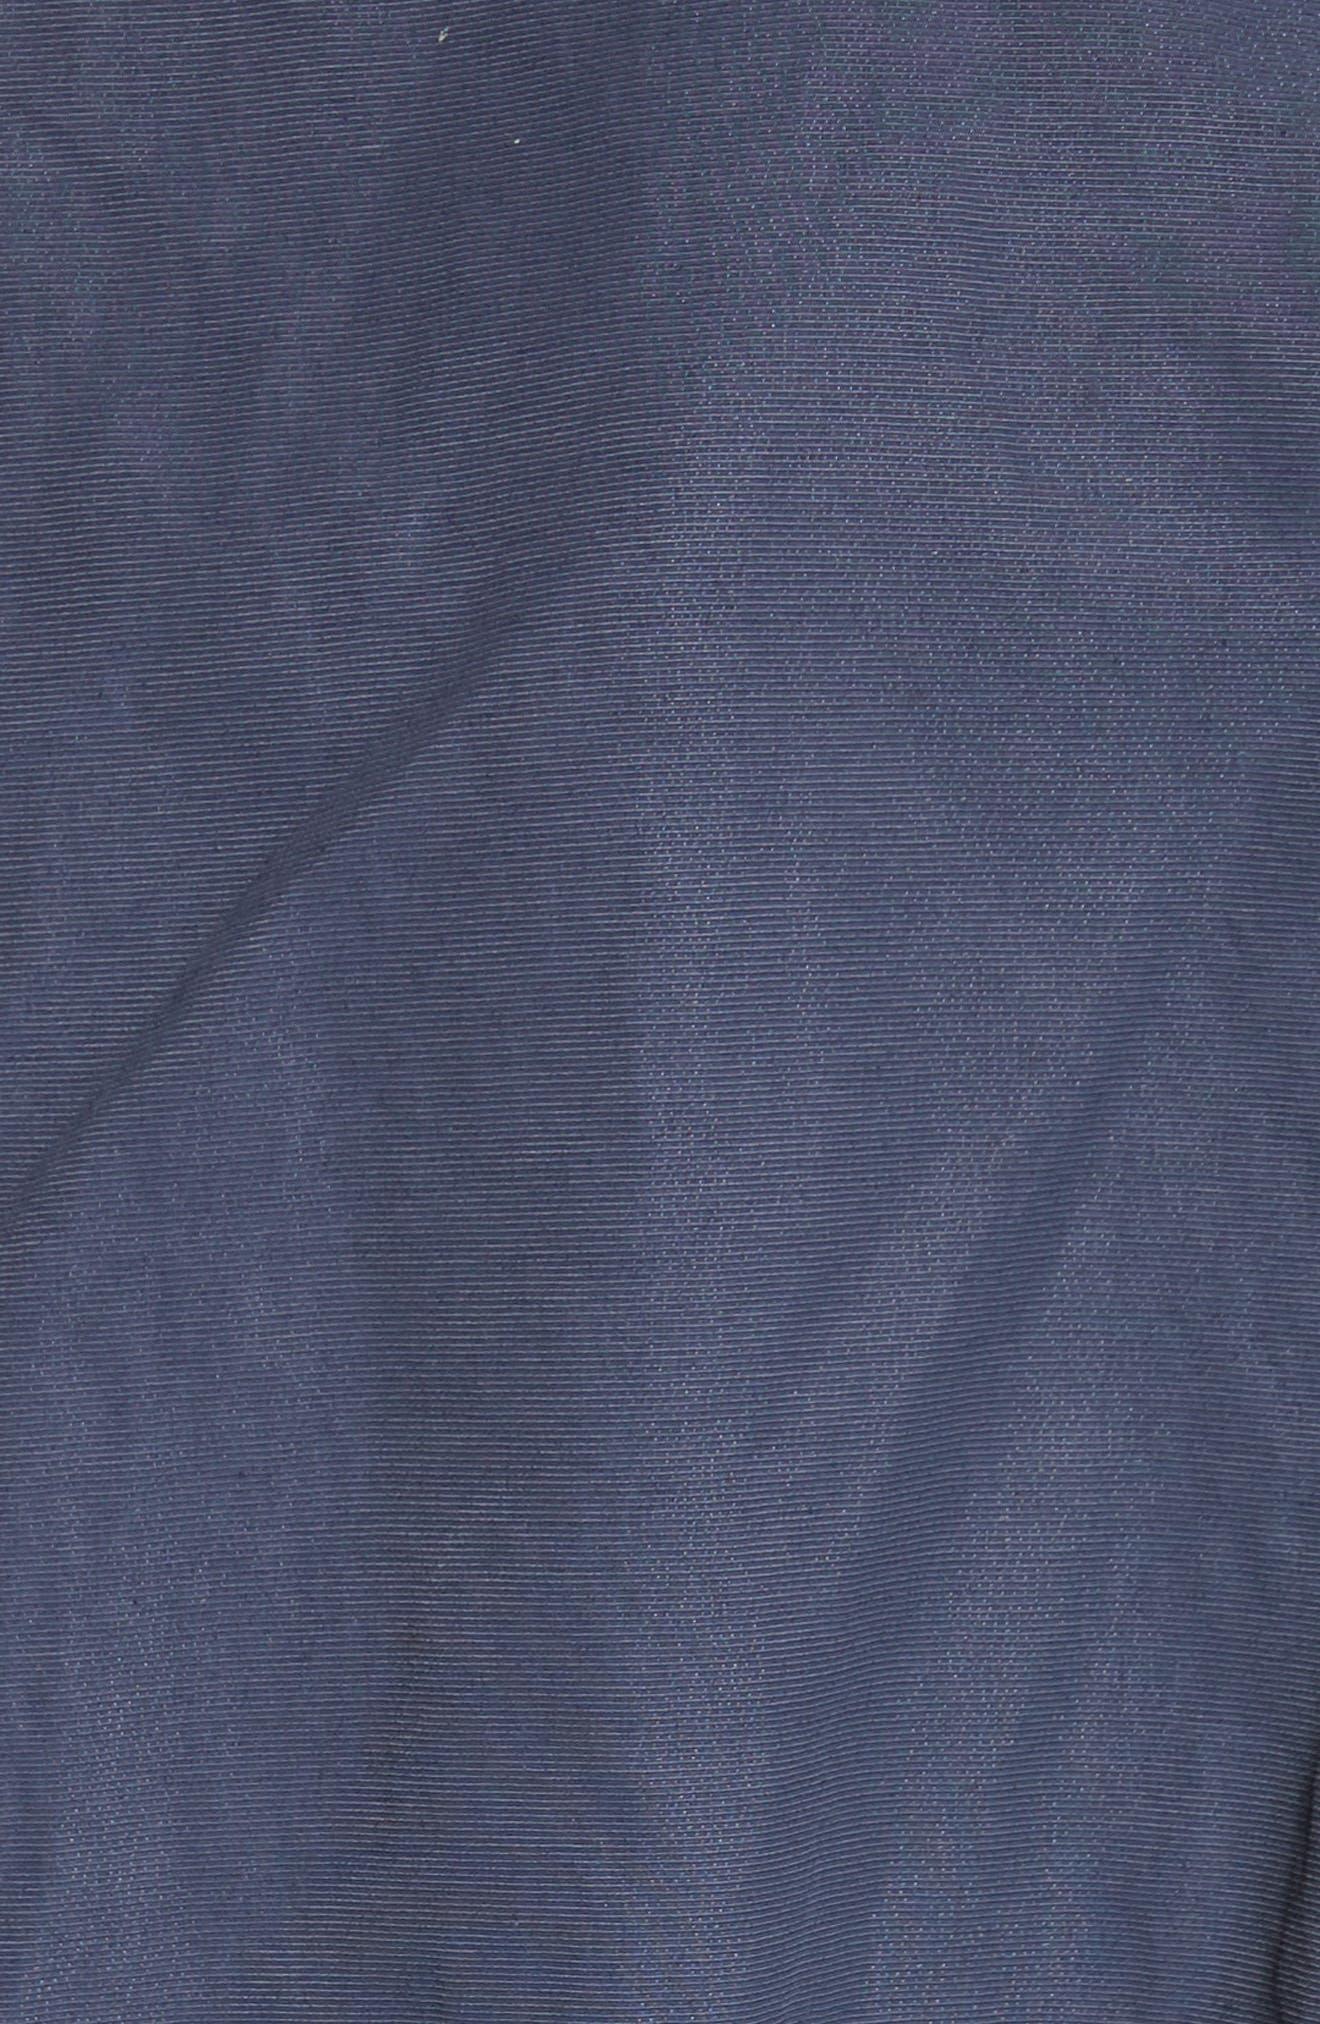 Suede & Cotton Blend Kimono Jacket,                             Alternate thumbnail 6, color,                             400